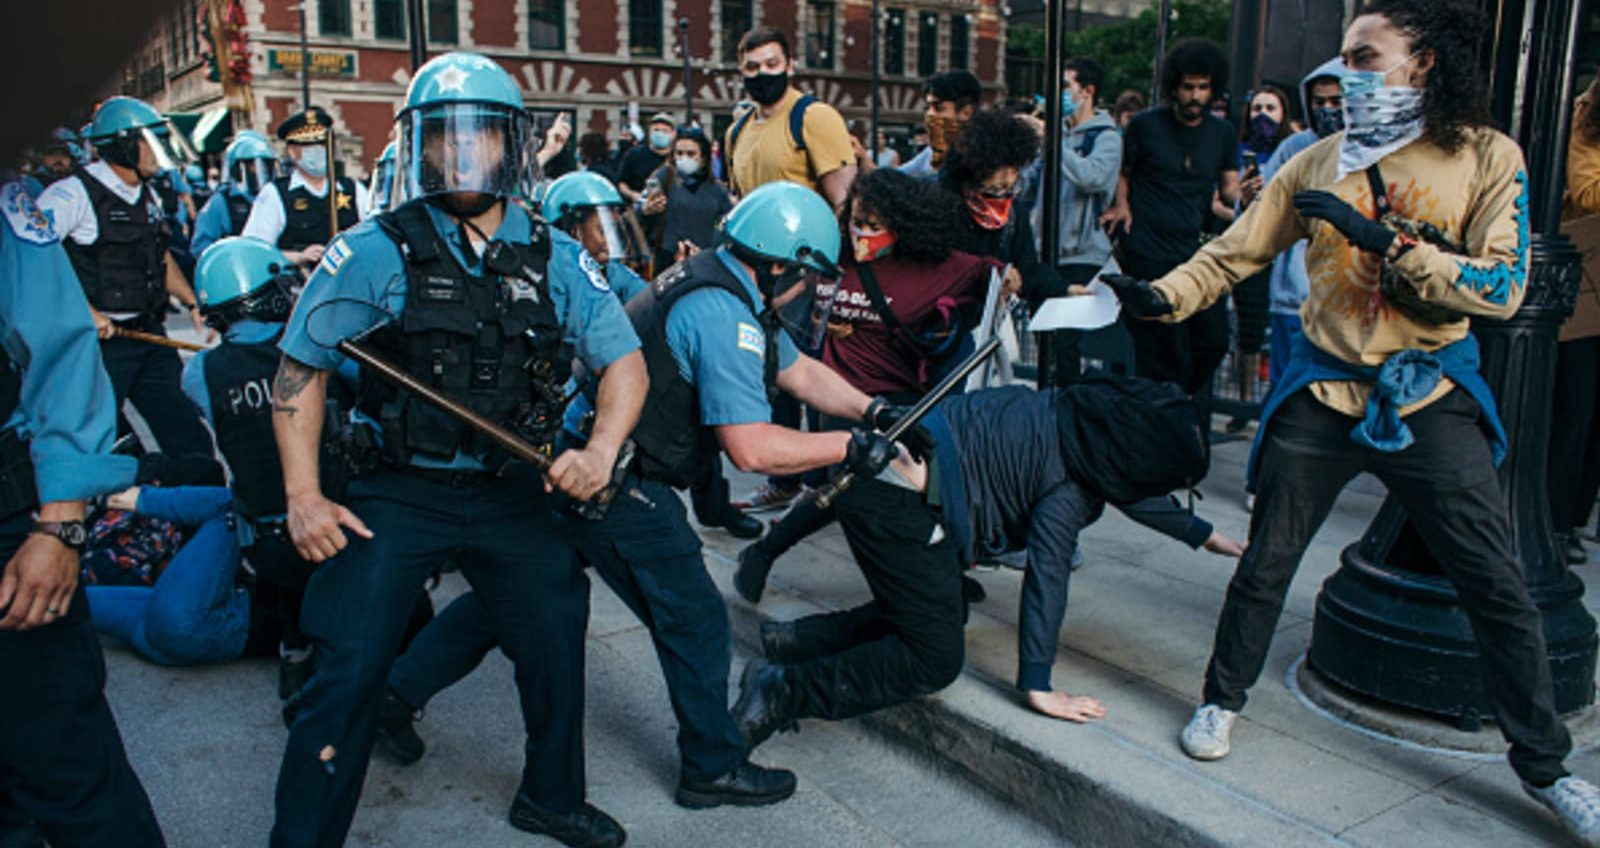 police-violence-e1603635538215.jpeg